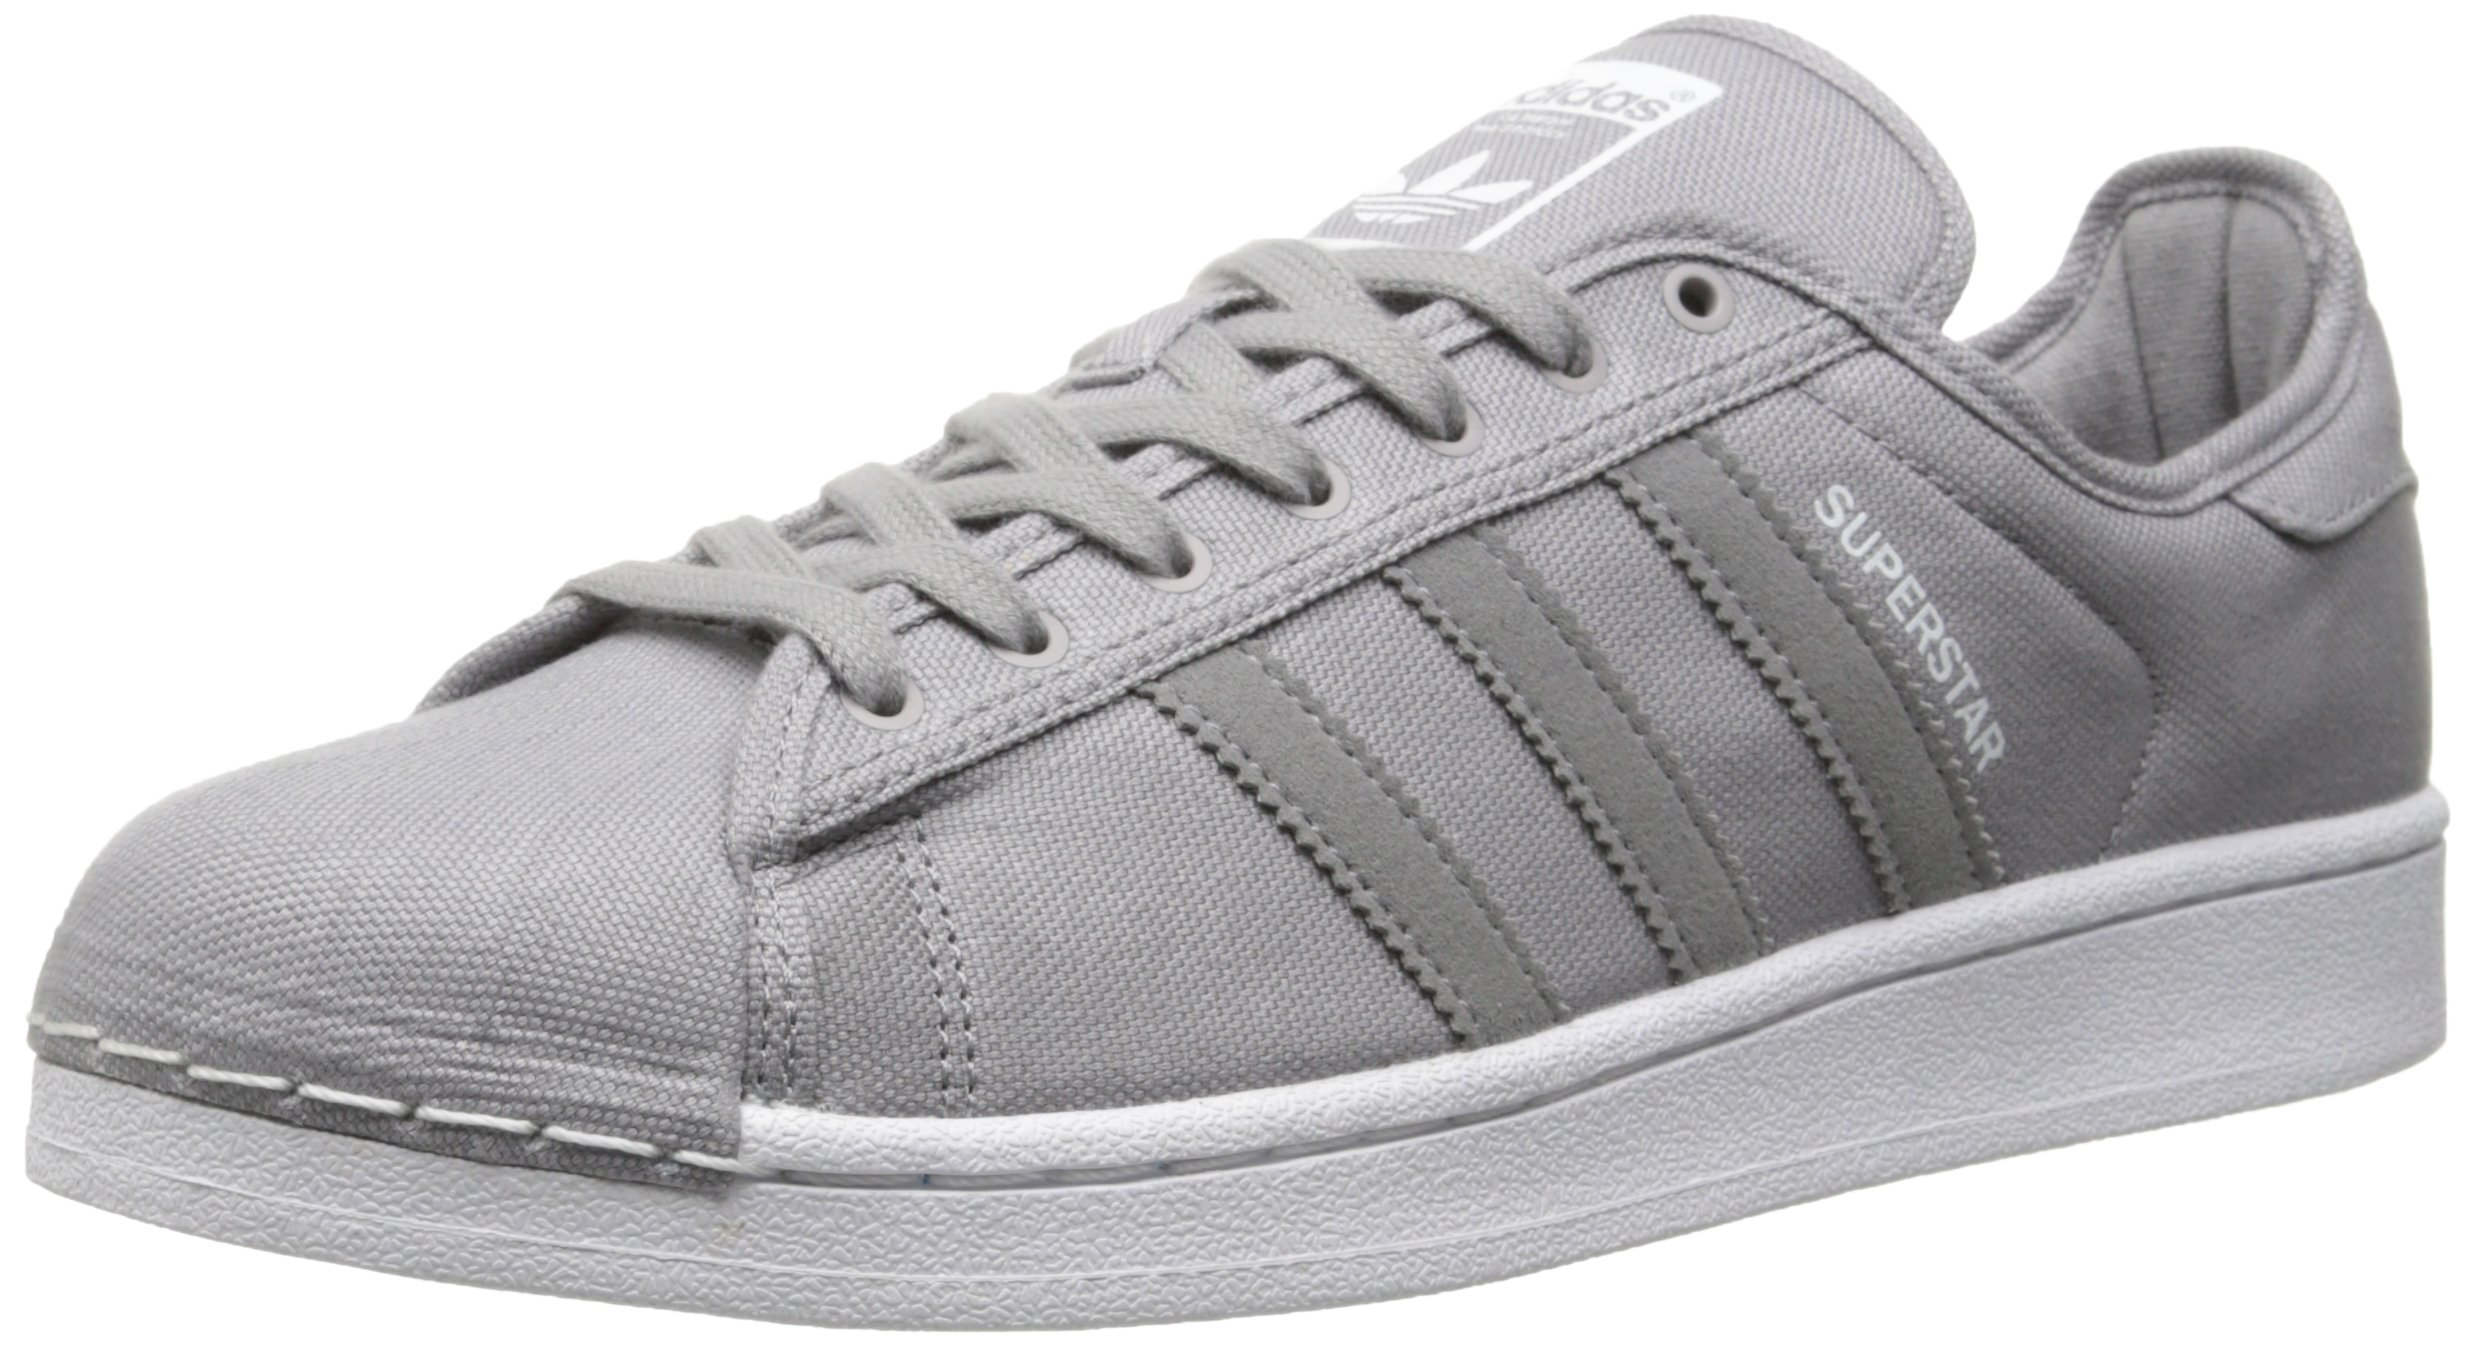 gorące nowe produkty wylot najlepszy hurtownik Galleon - Adidas Originals Men's Superstar Festival Pack ...